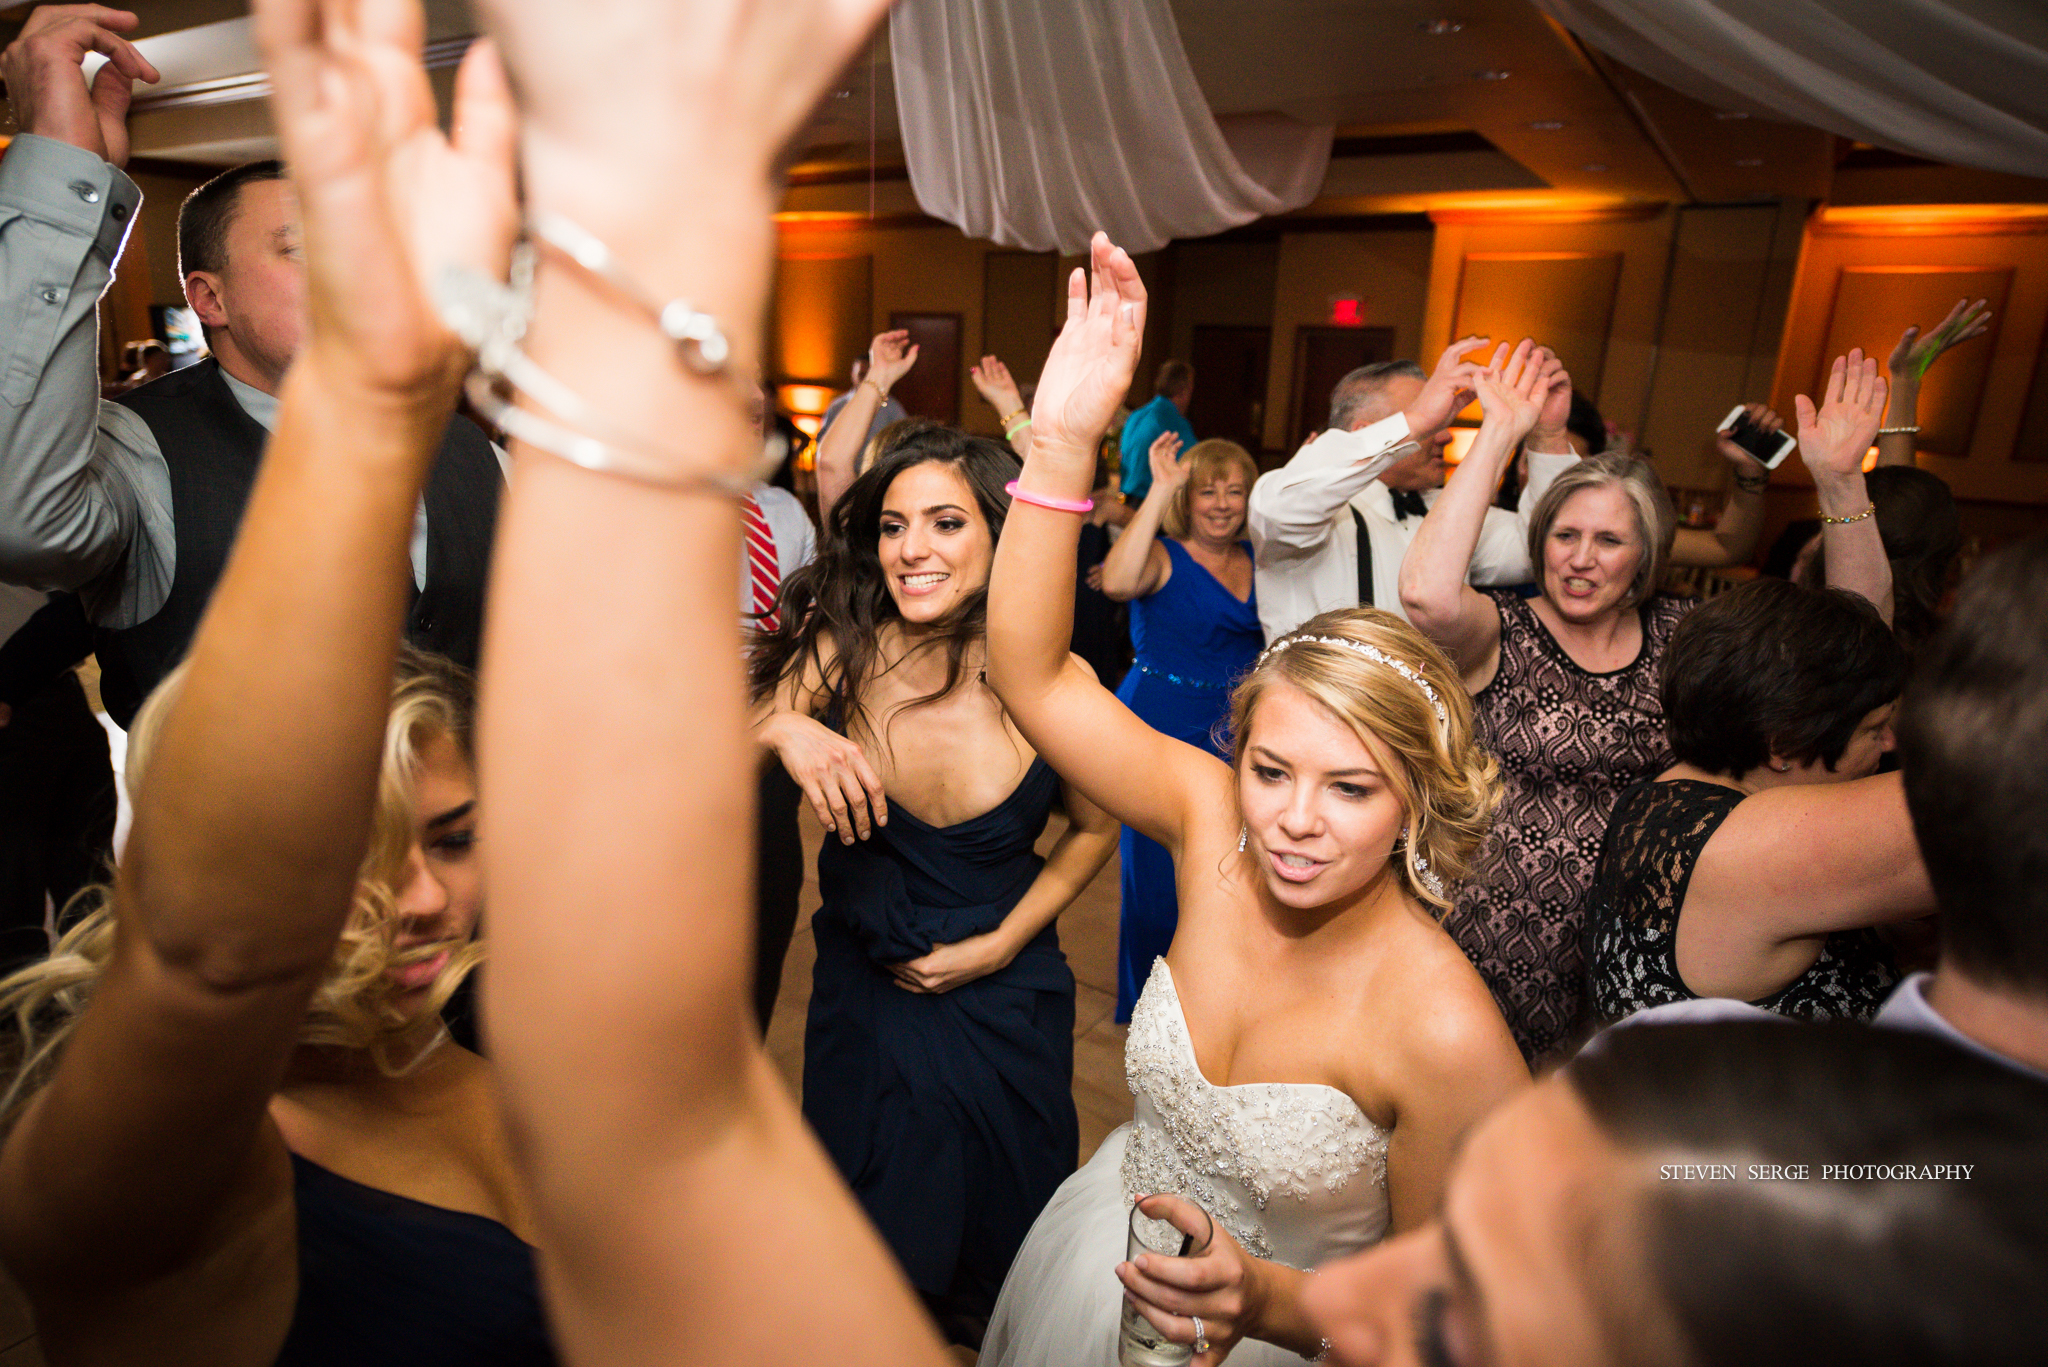 scranton-wedding-photographers-hilton-steven-serge-photography-39.jpg